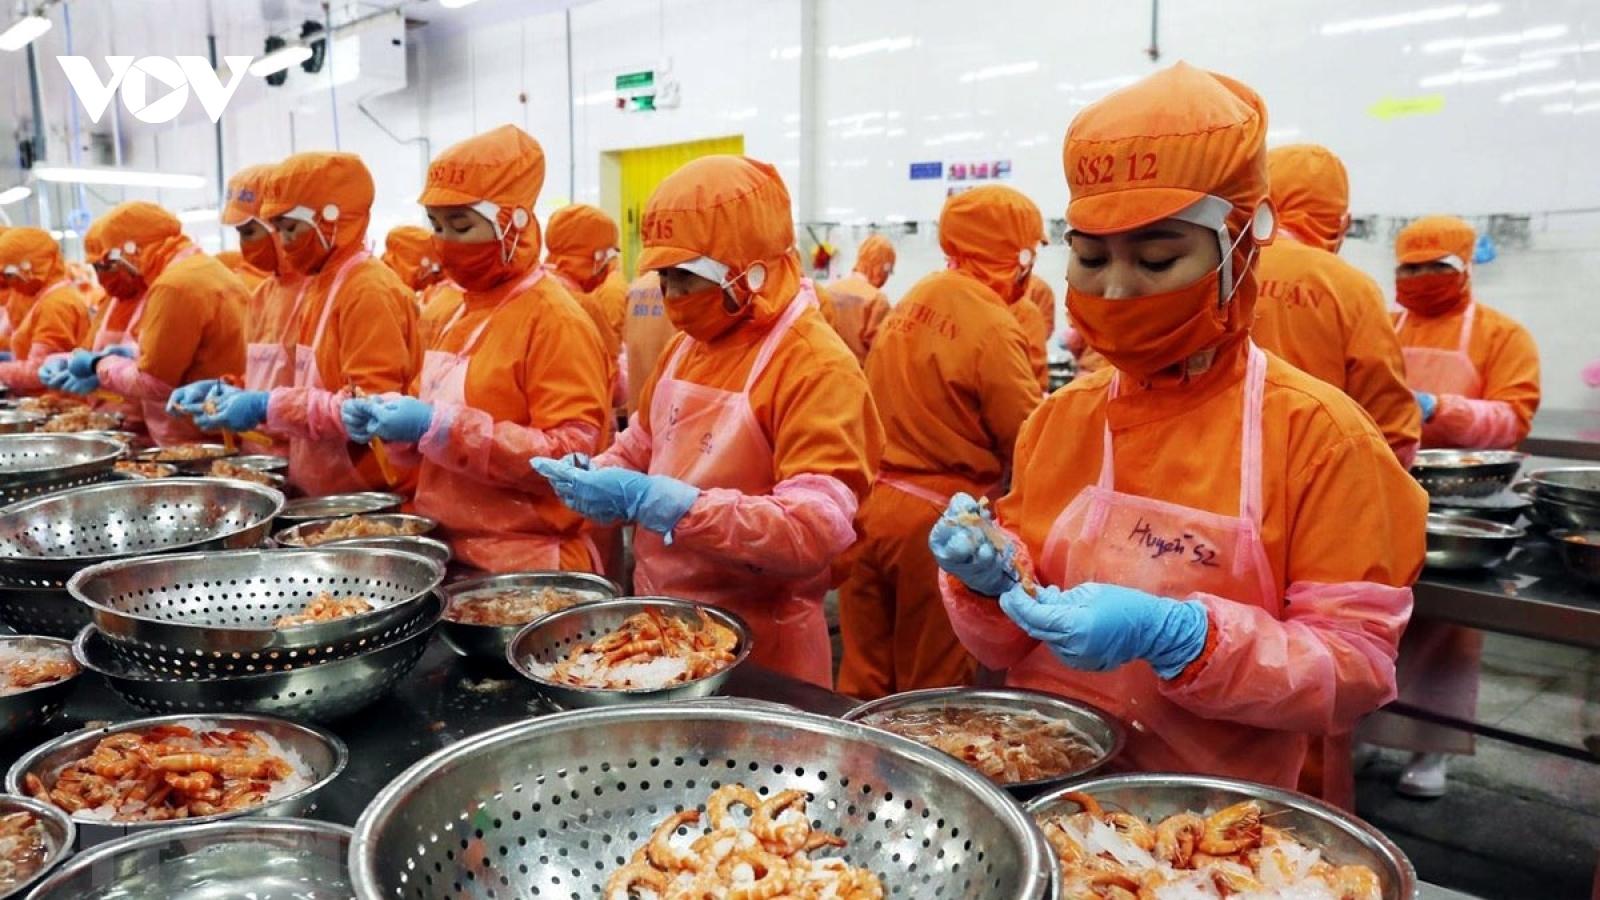 Anti-pandemic efforts should be made alongside EVFTA enforcement